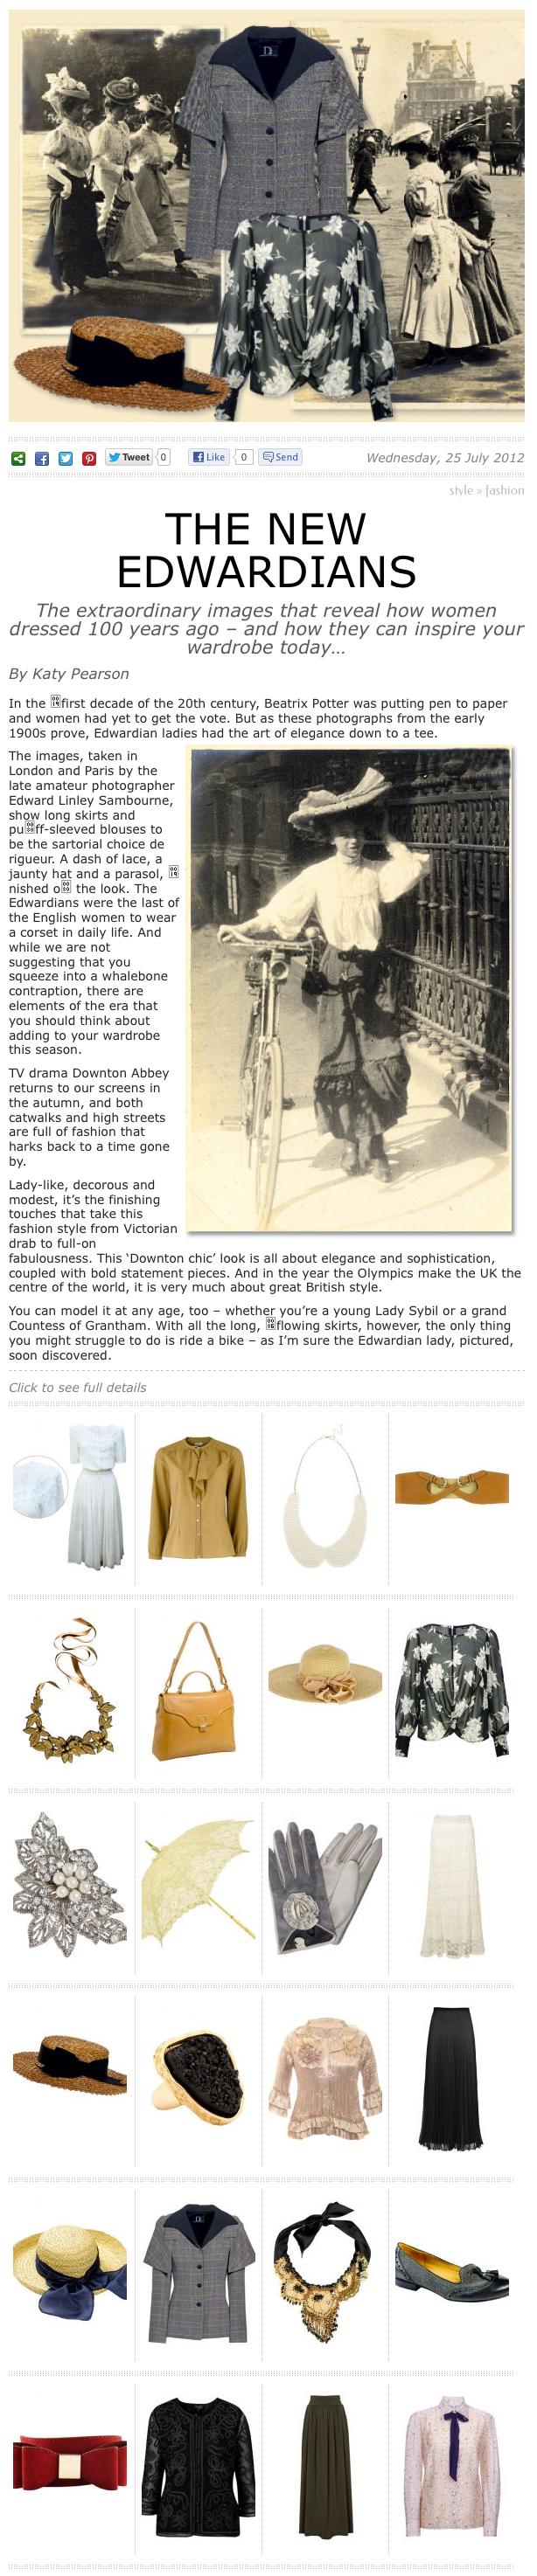 The Lady Magazine / July 2012